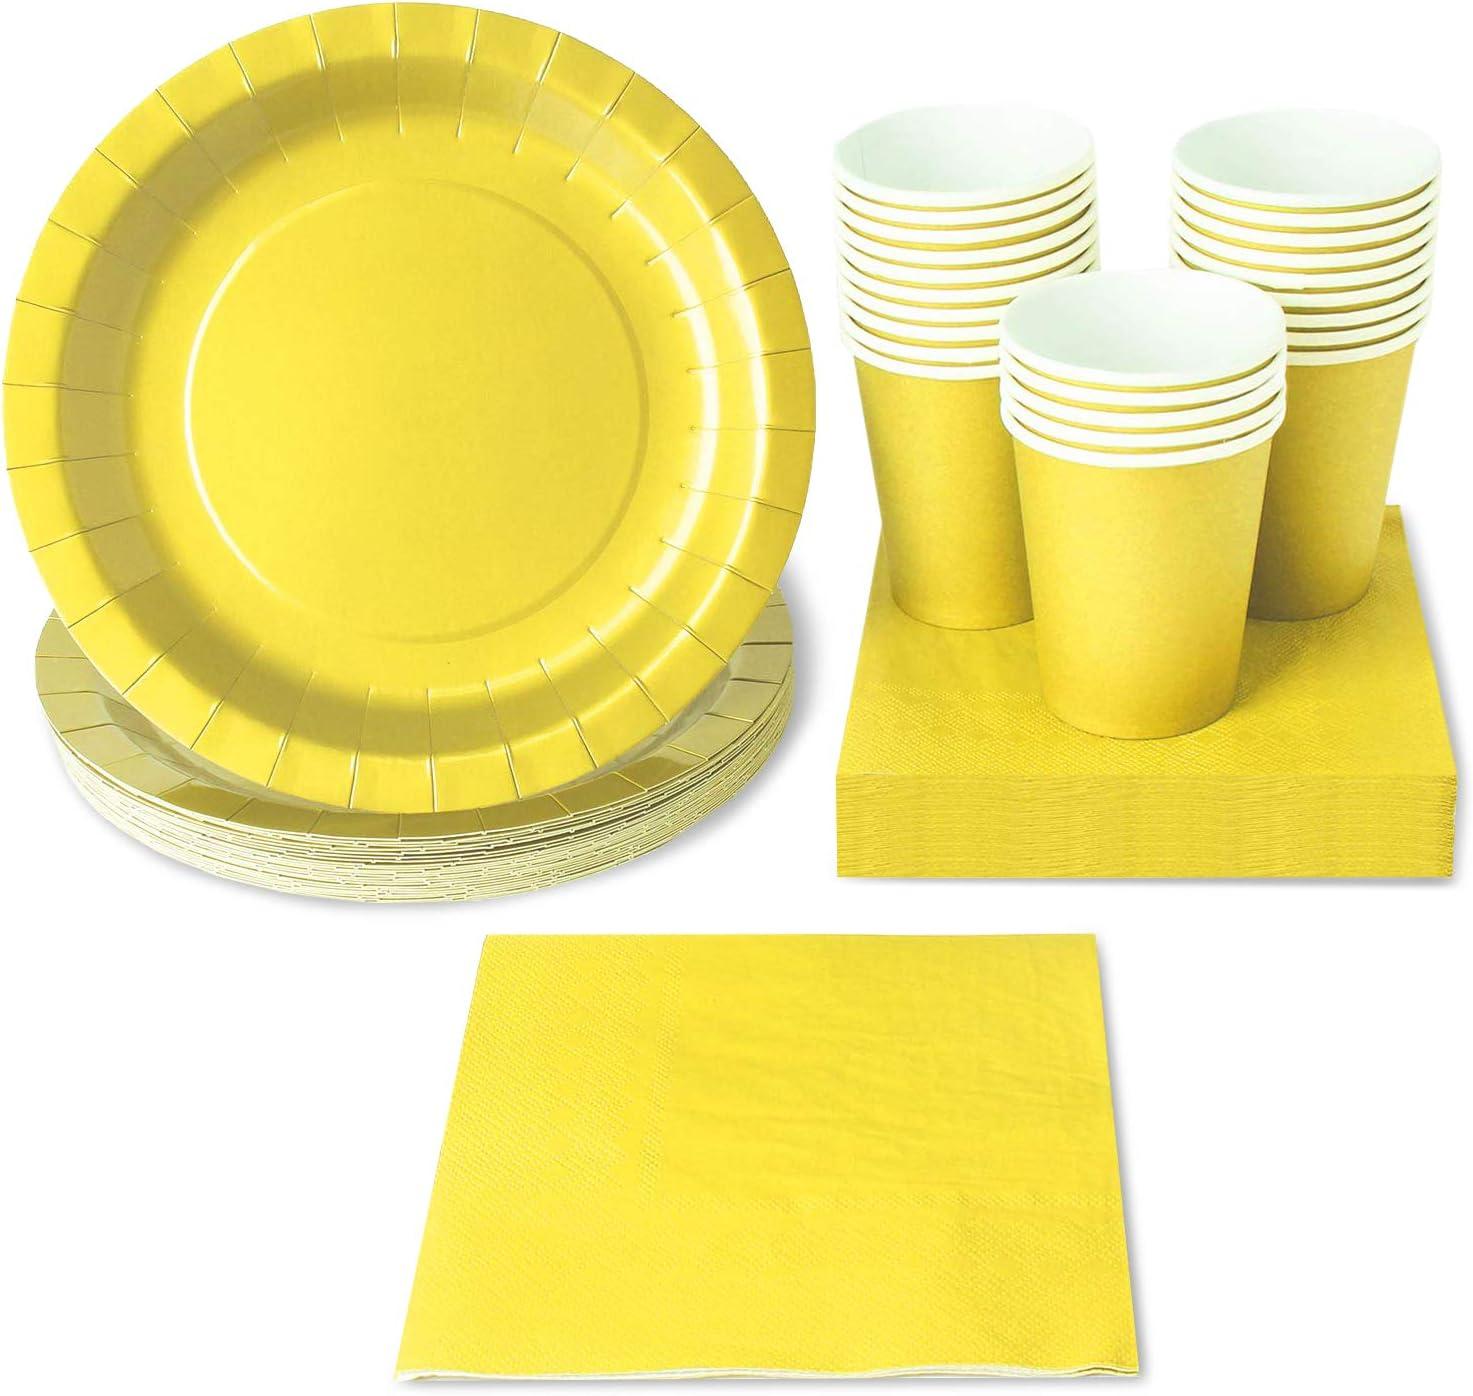 Juvale desechable de vajilla - Sirve 24 - Fiesta Amarillo -, Amarillas